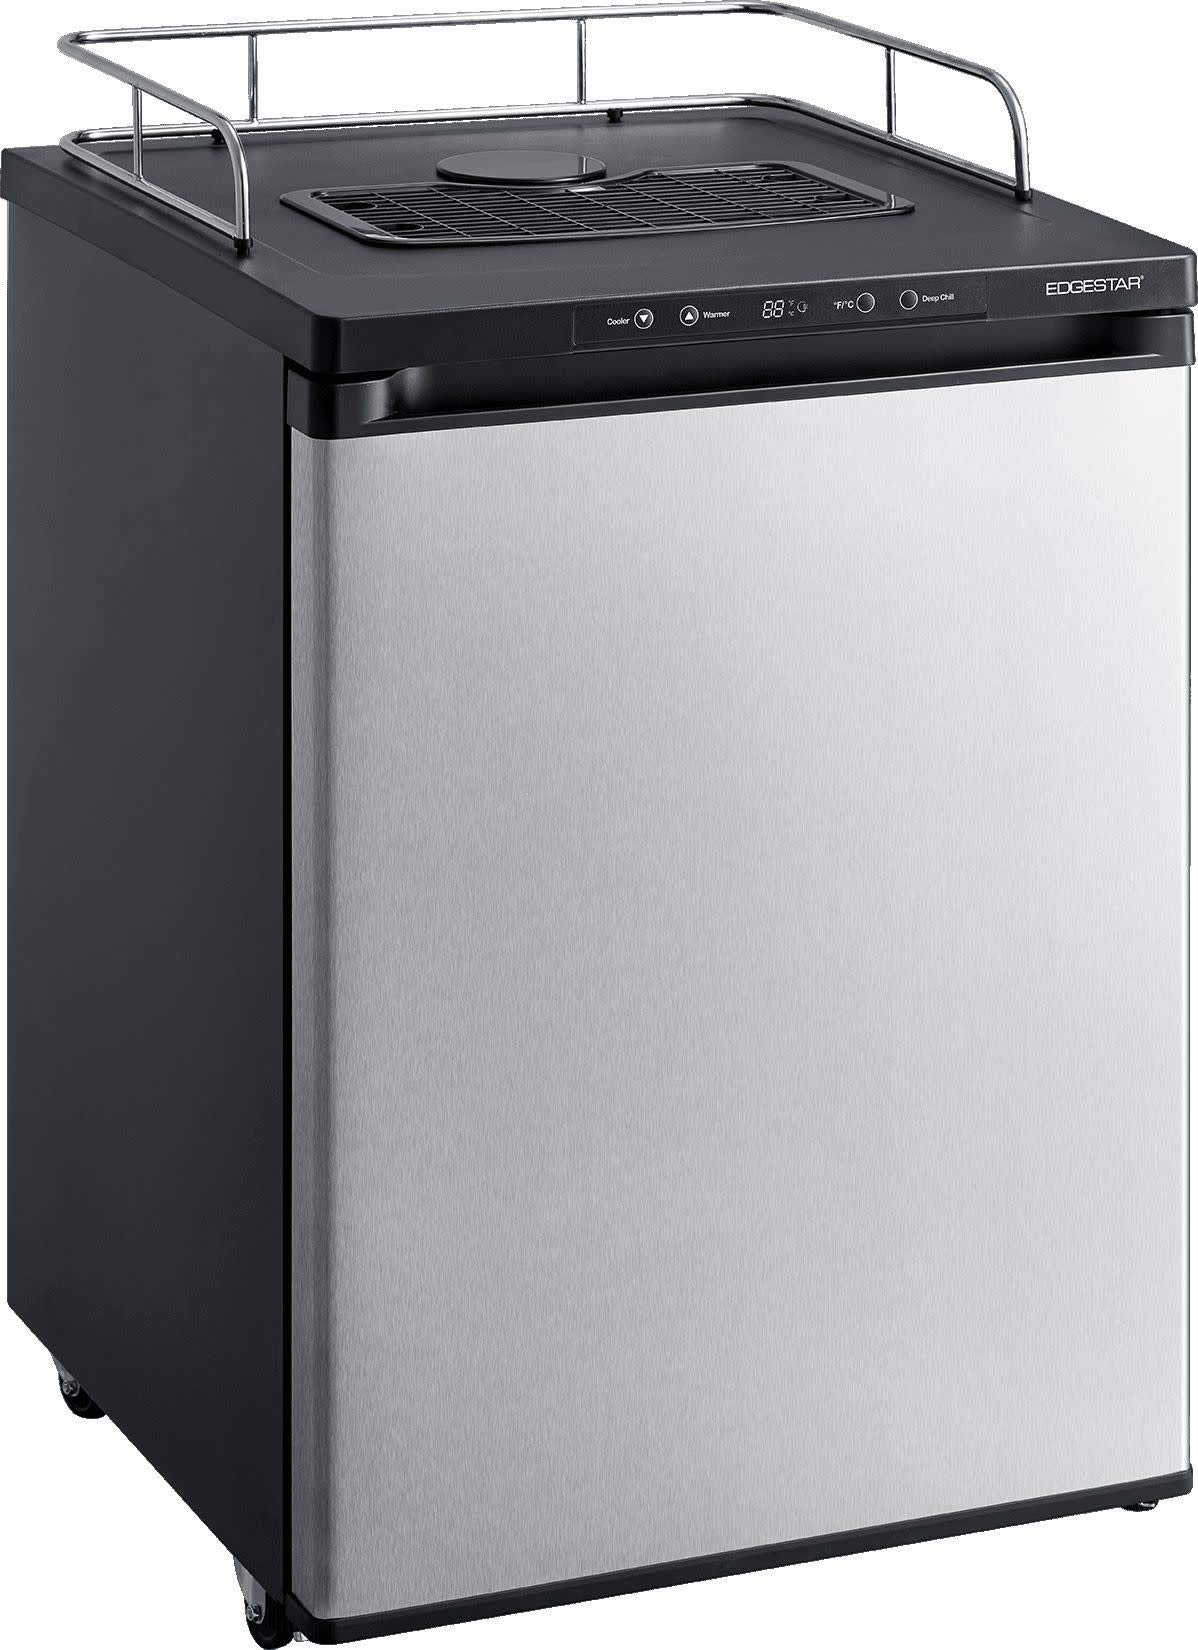 EdgeStar BR3002SS 24 Inch Wide Kegerator Conversion Refrigerator for Full Size Keg - Stainless Steel